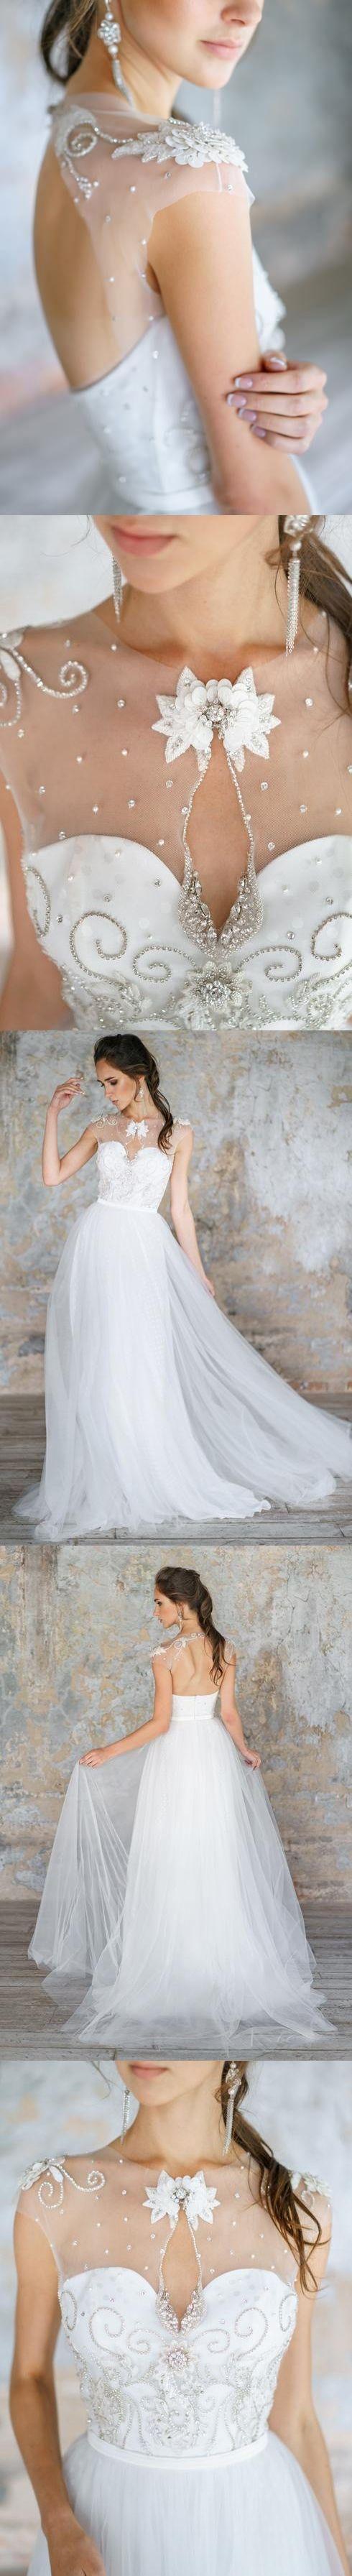 Chic Wedding Dresses A Line Scoop Rhinestone Short Train Tulle Bridal Gown JKW153